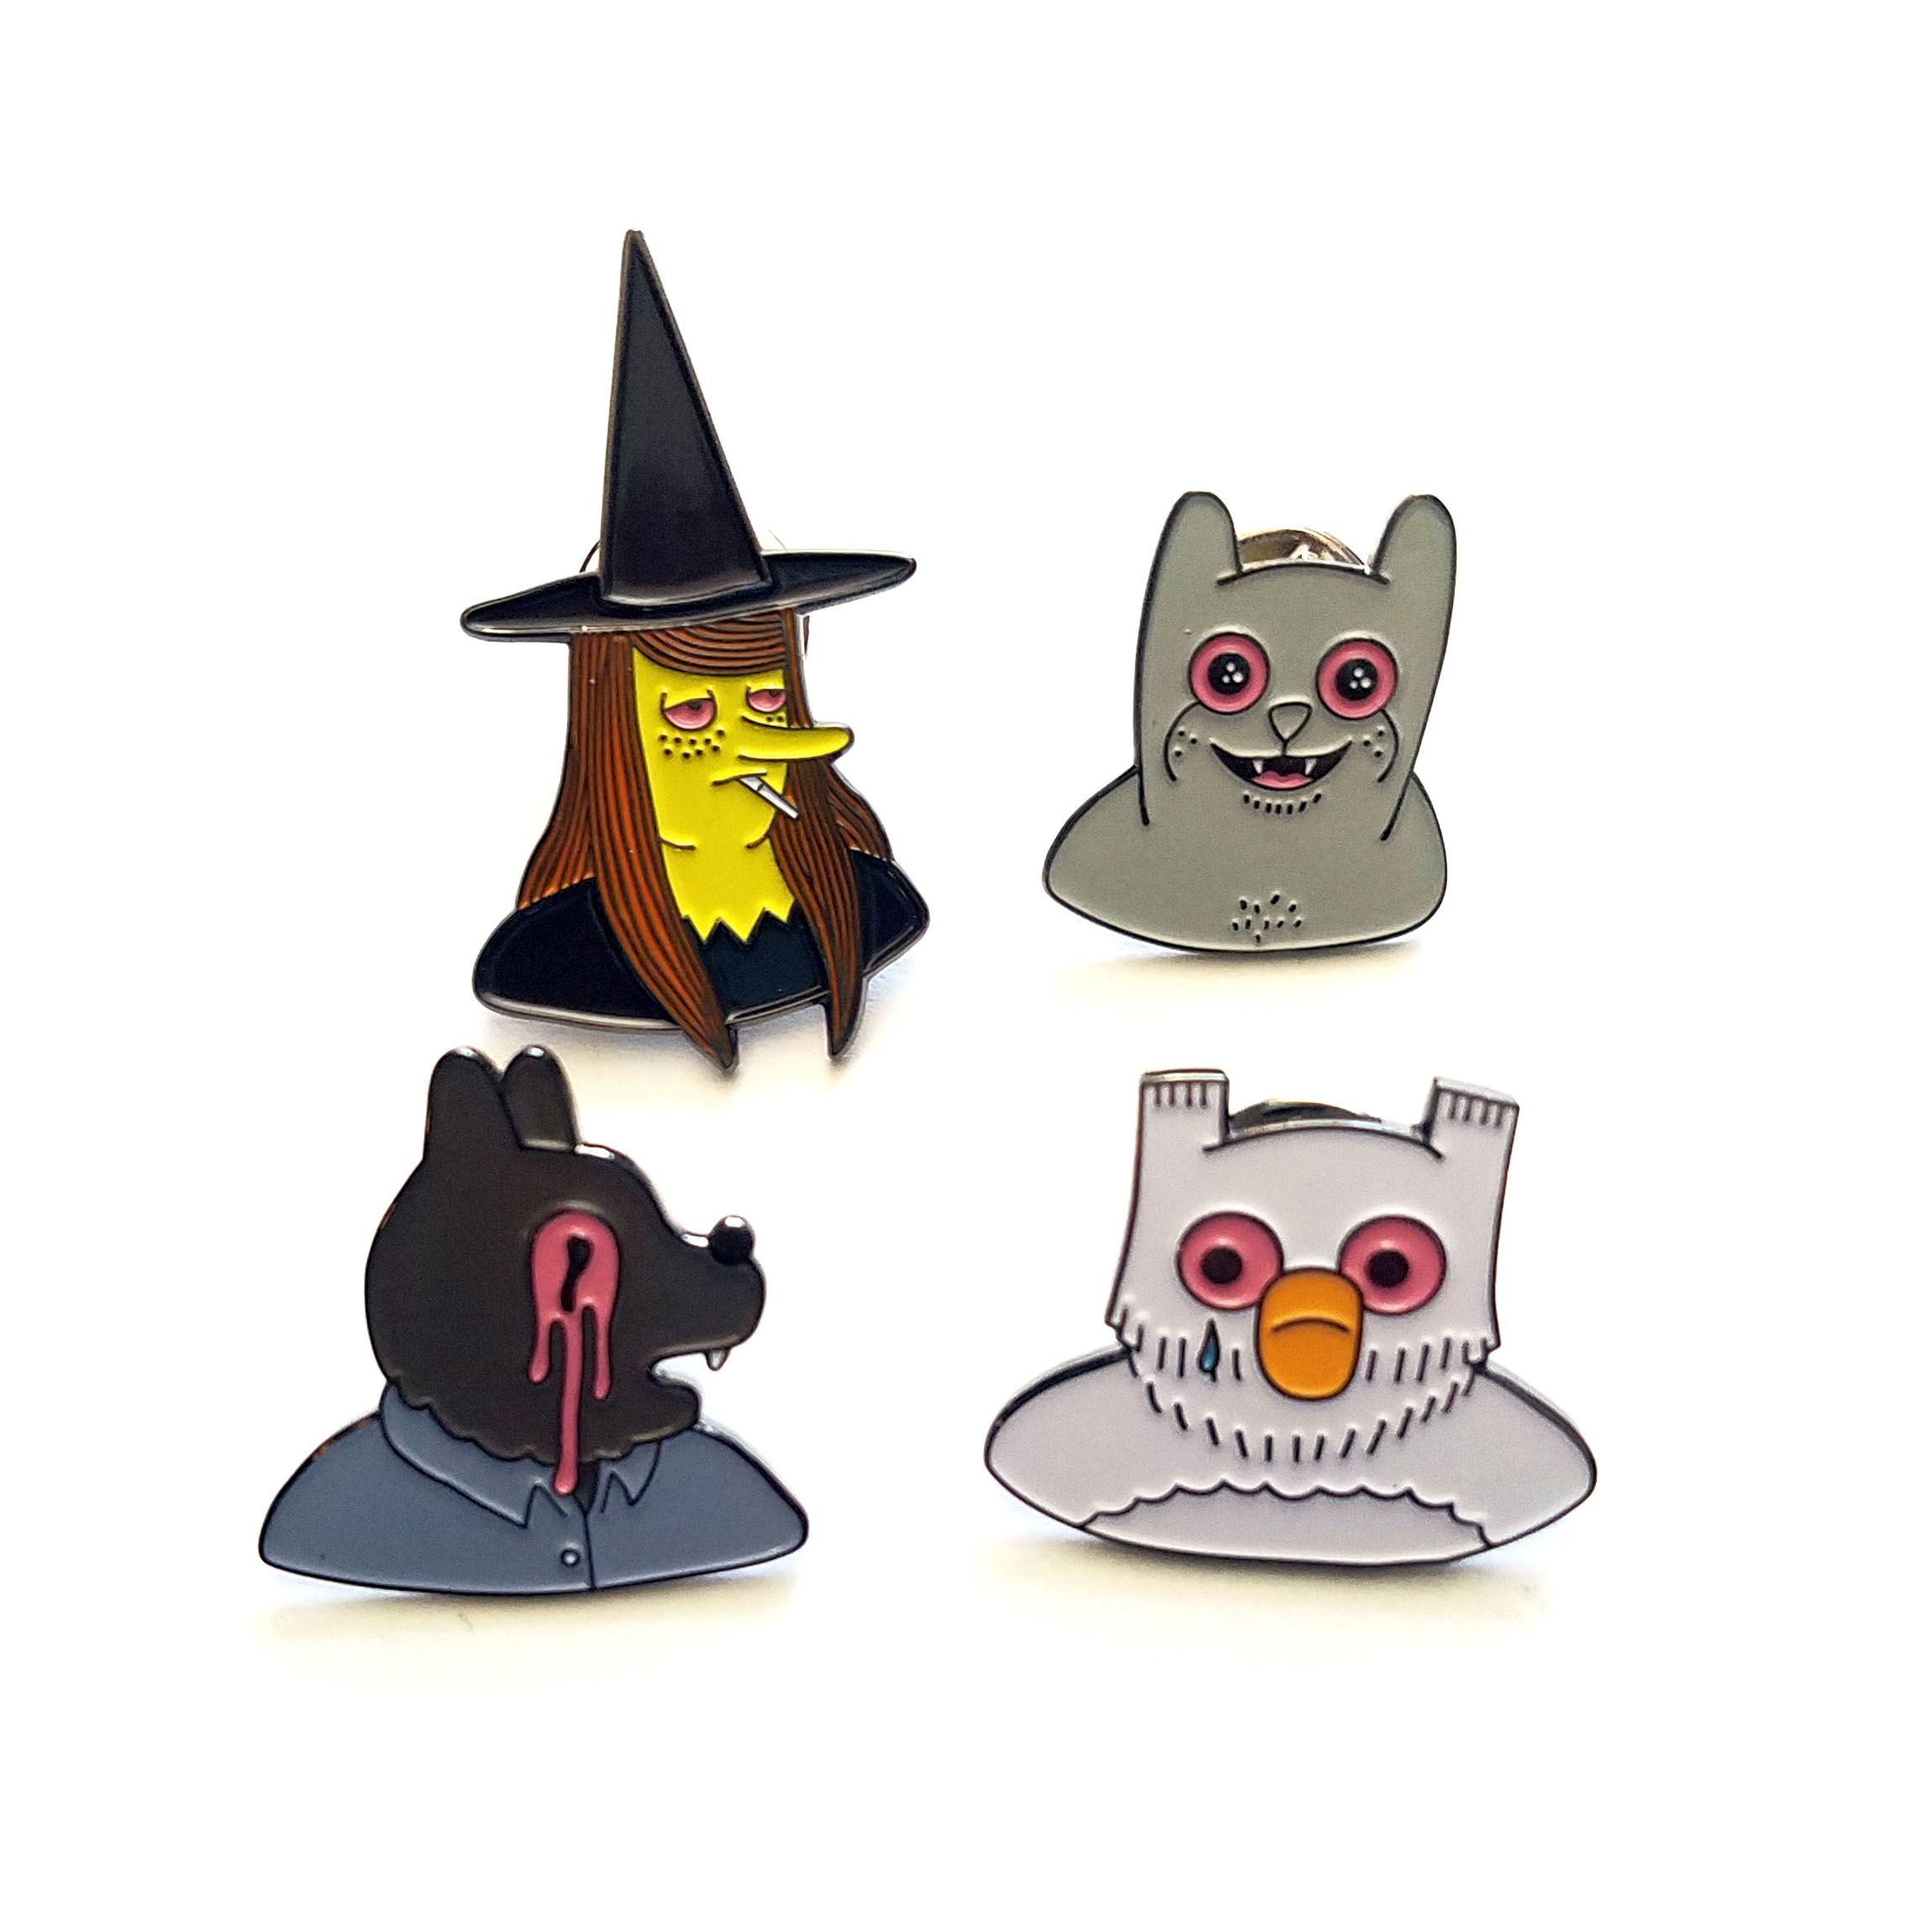 Simon Hanselmanns Megg, Mogg, Owl And Werewolf Jones Pins Httpsecretheadquarterslimitedruncomproducts594692 Simon Hanselmann Pins